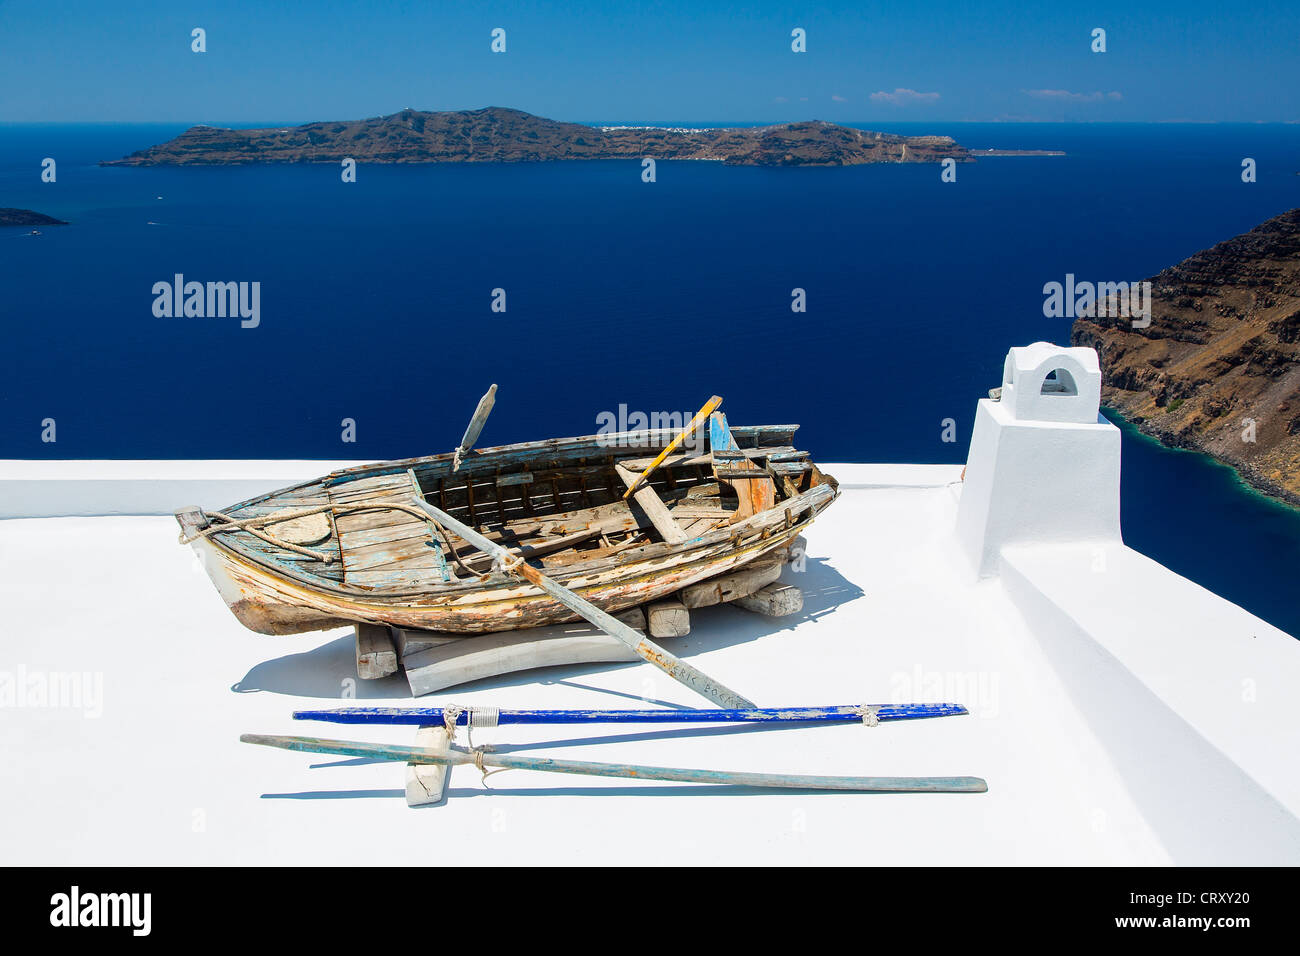 Santorini, Weathered wooden boat on balcony Stock Photo